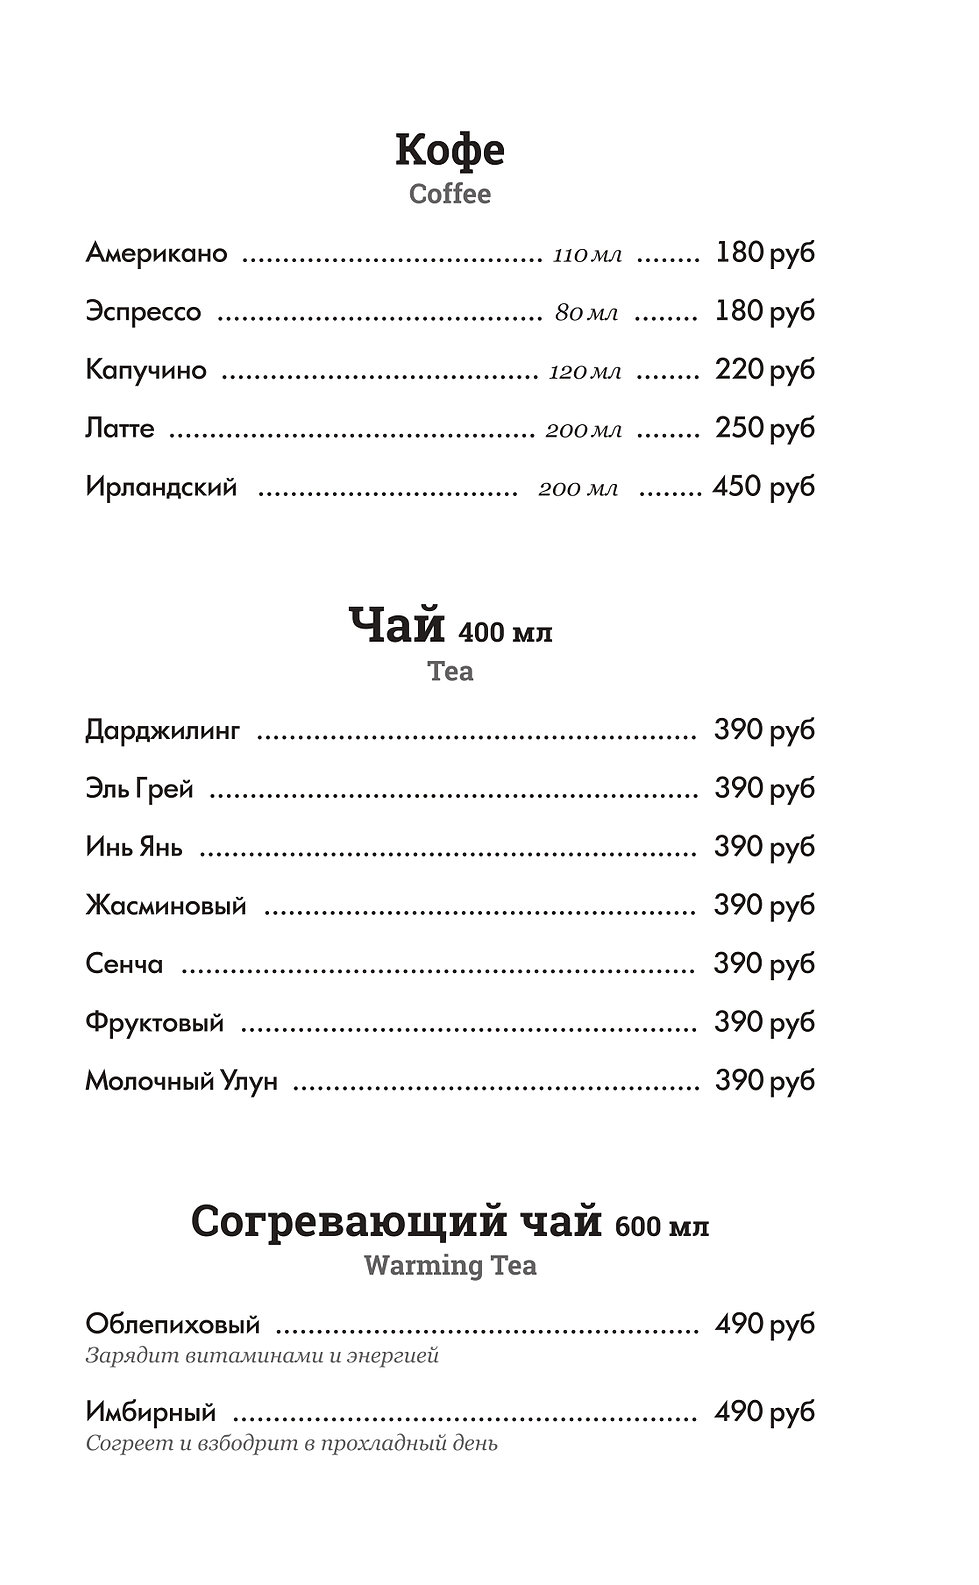 S46_bar_2021_ (2)_page-0014.jpg